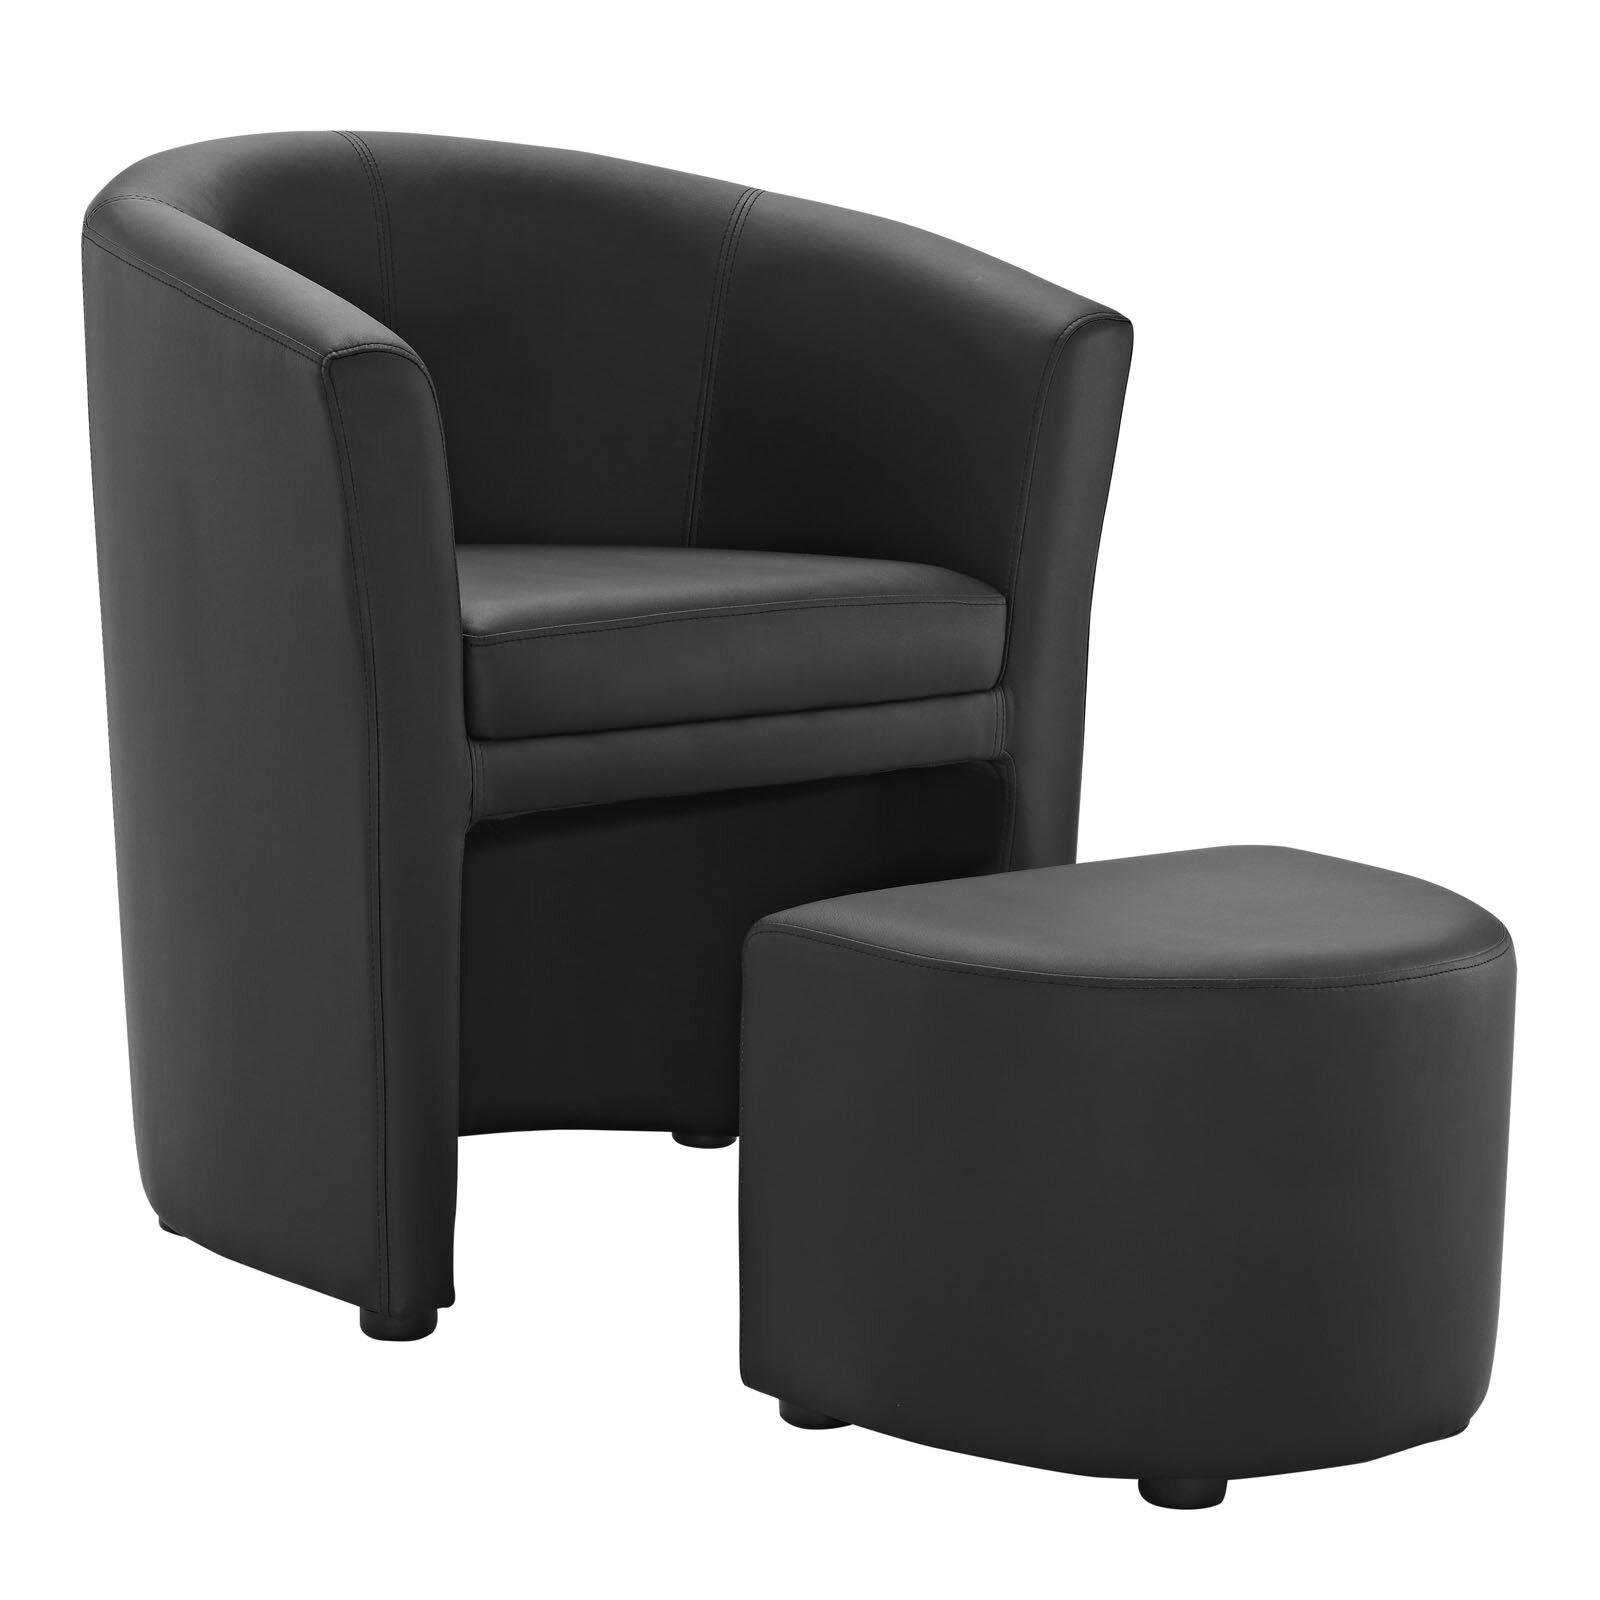 Swell Darvin Barrel Chair And Ottoman Reviews Allmodern Cjindustries Chair Design For Home Cjindustriesco